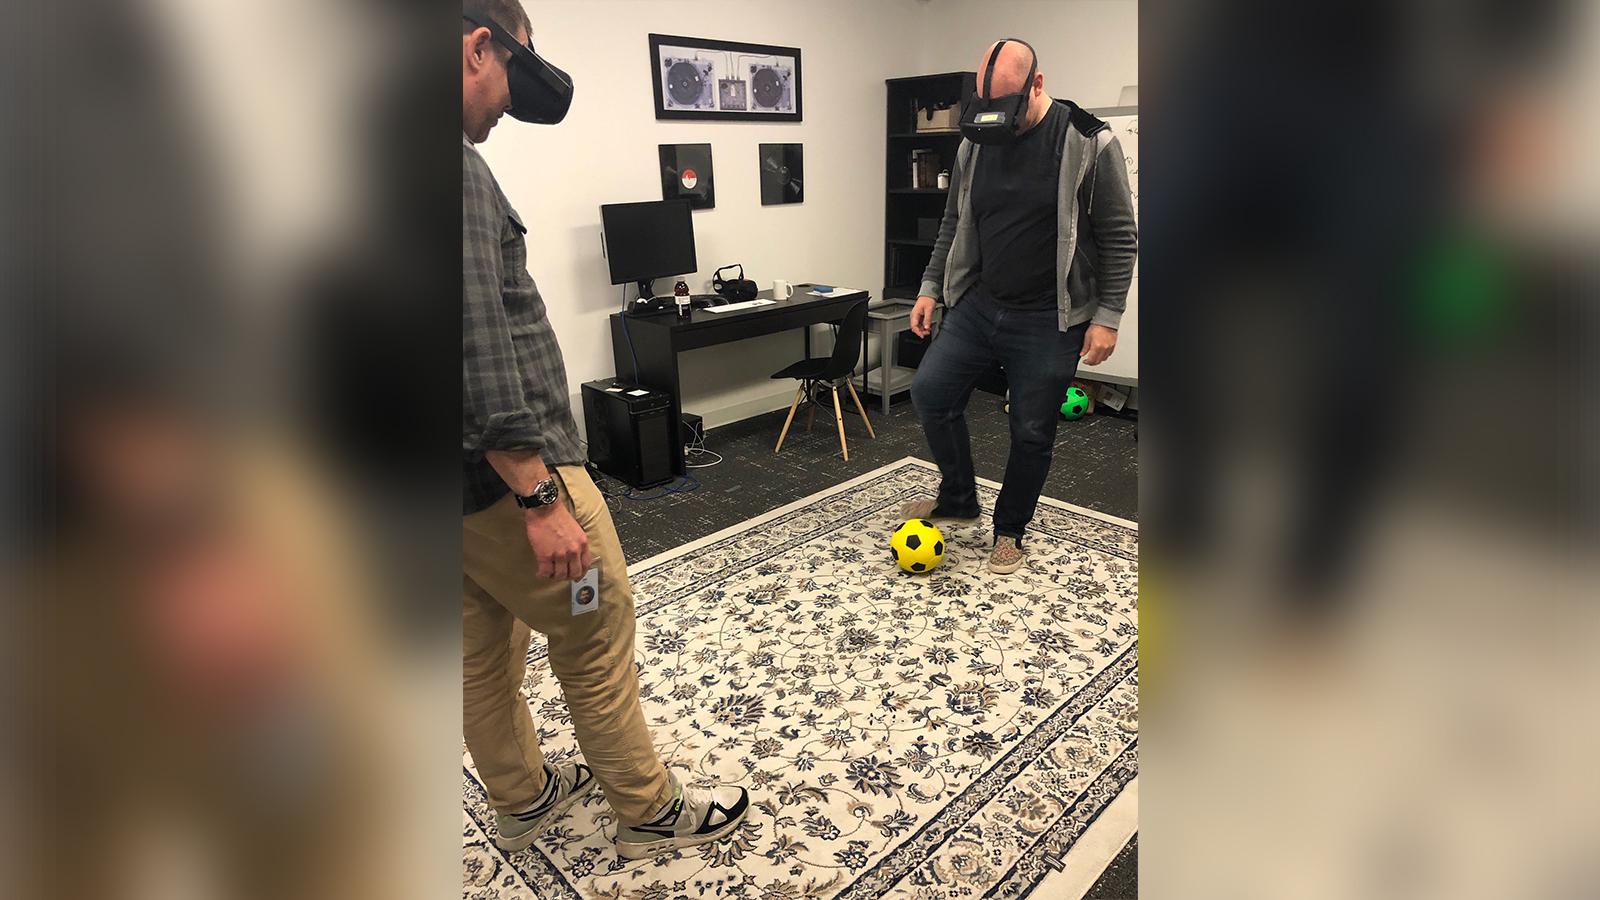 The Oculus Santa Cruz Might Be A Mixed Reality Headset